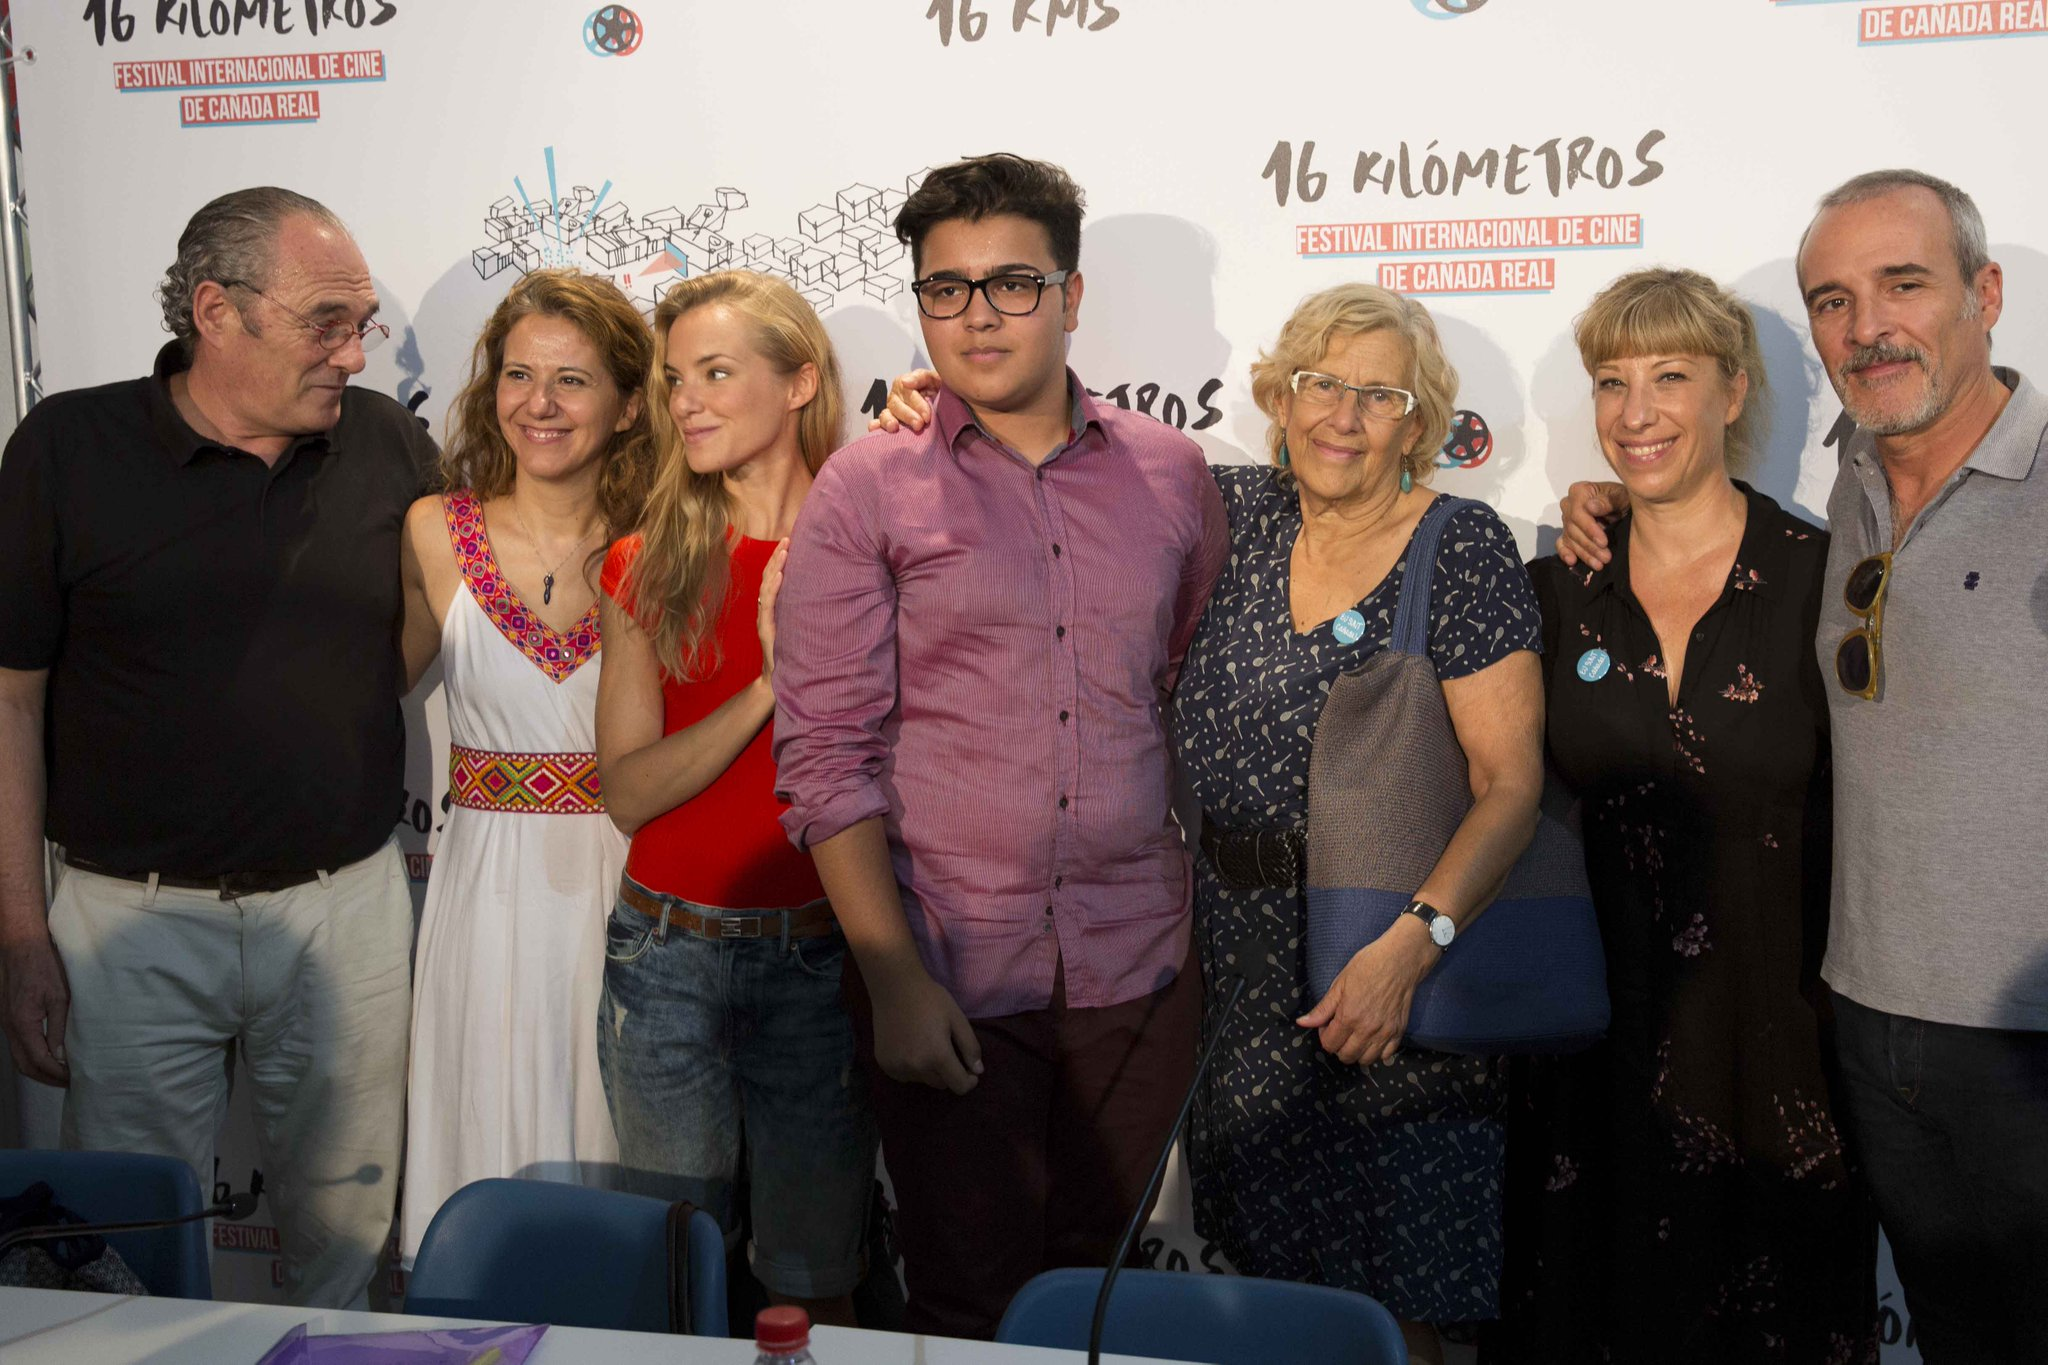 Presentación del festival de cine @Festival16kms en la Cañada Real: https://t.co/wSCoox7EC5 https://t.co/6uXFdv2nPw